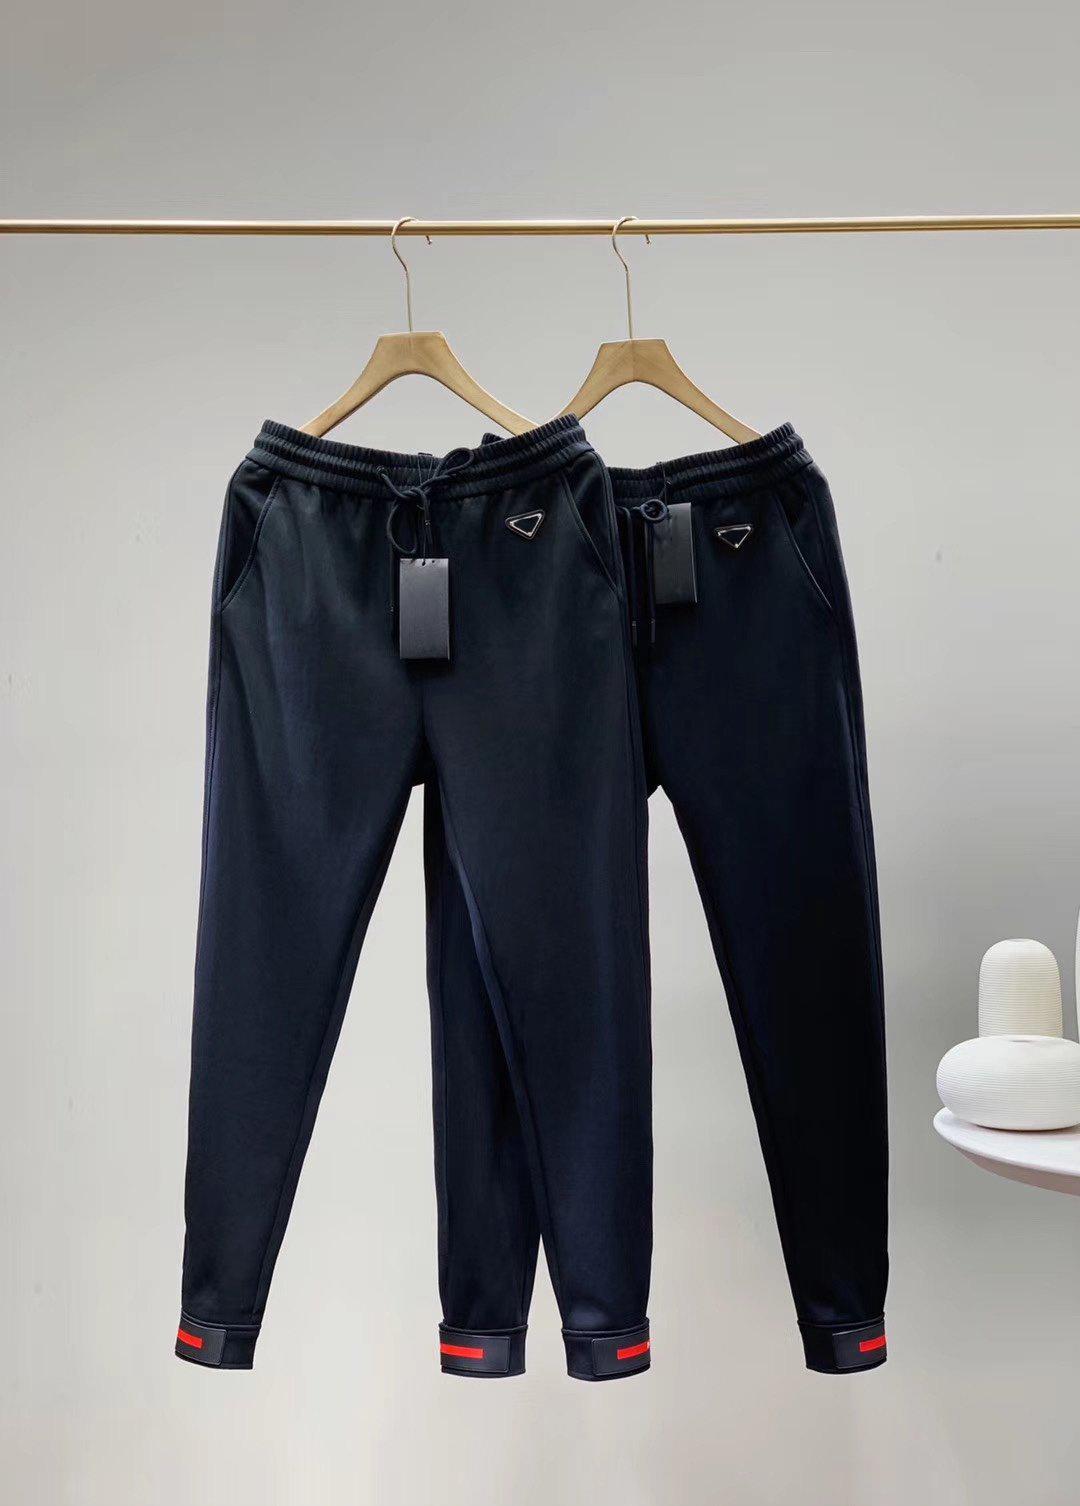 Pantalones Sexy Pantalones Online Pantalones Sexy Pantalones Online En Venta En Es Dhgate Com